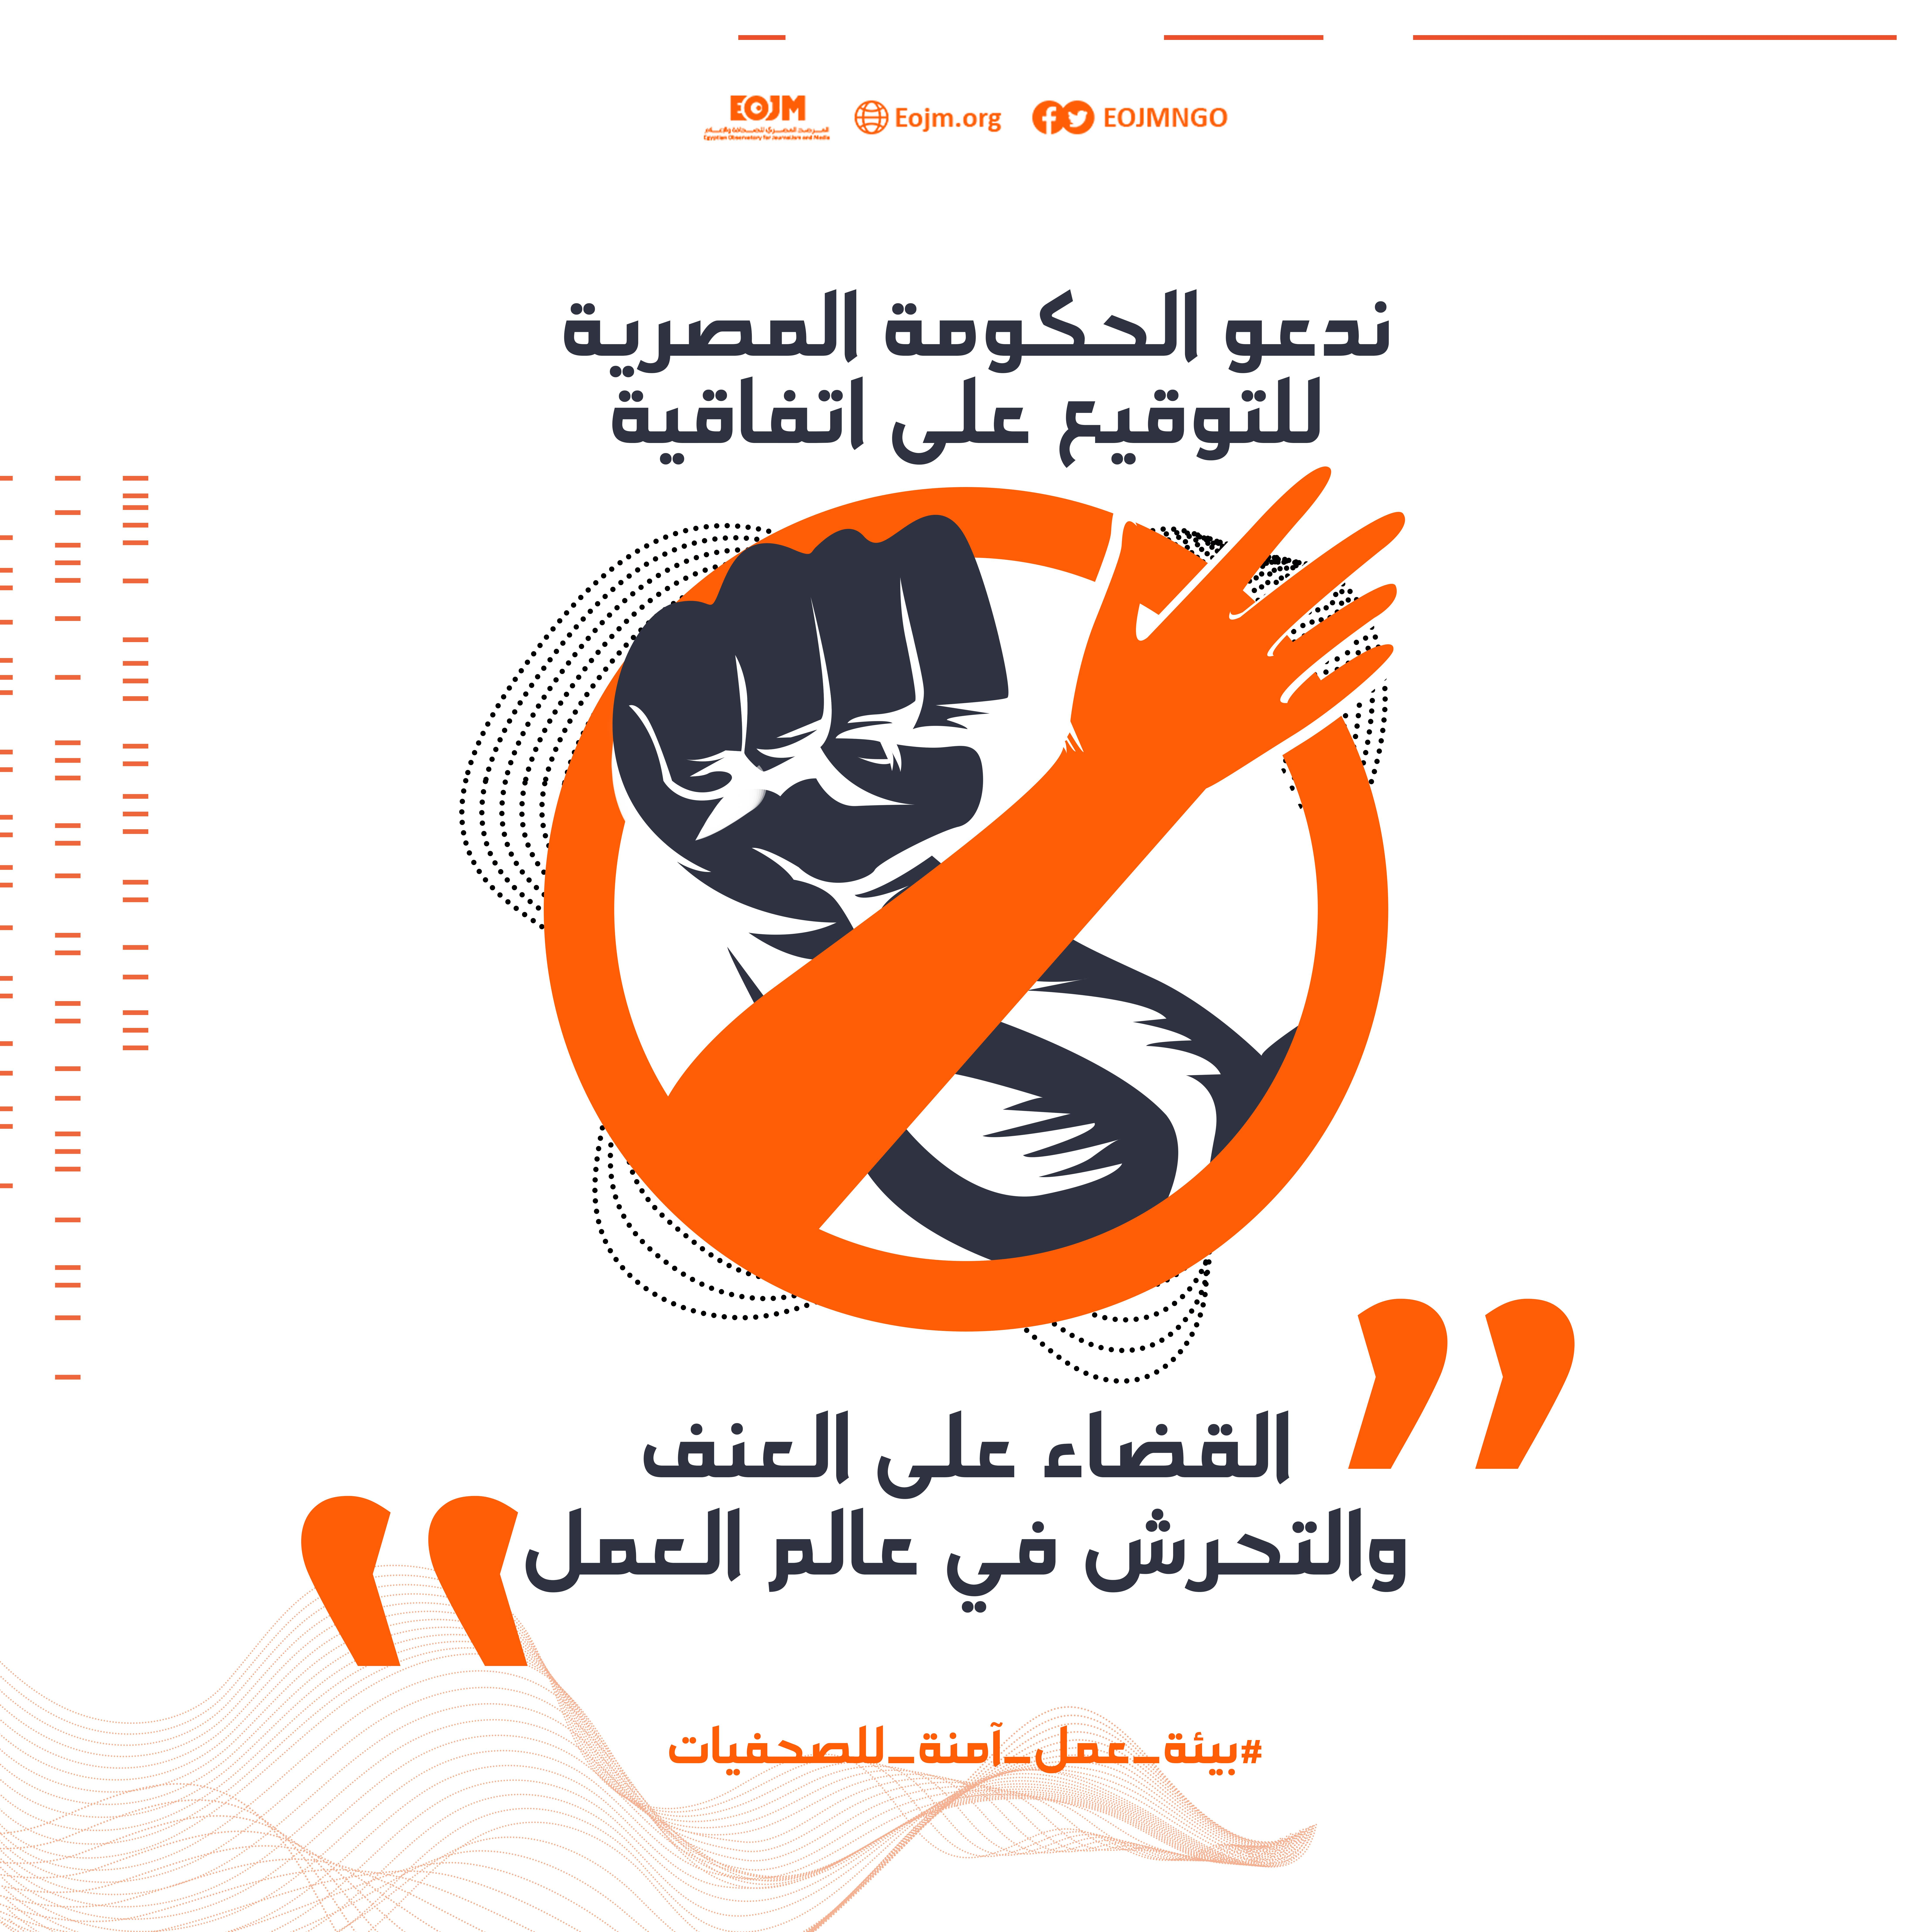 "Photo of ندعو الحكومة المصرية للتوقيع على اتفاقية ""القضاء على العنف والتحرش في عالم العمل"" (بيان)"